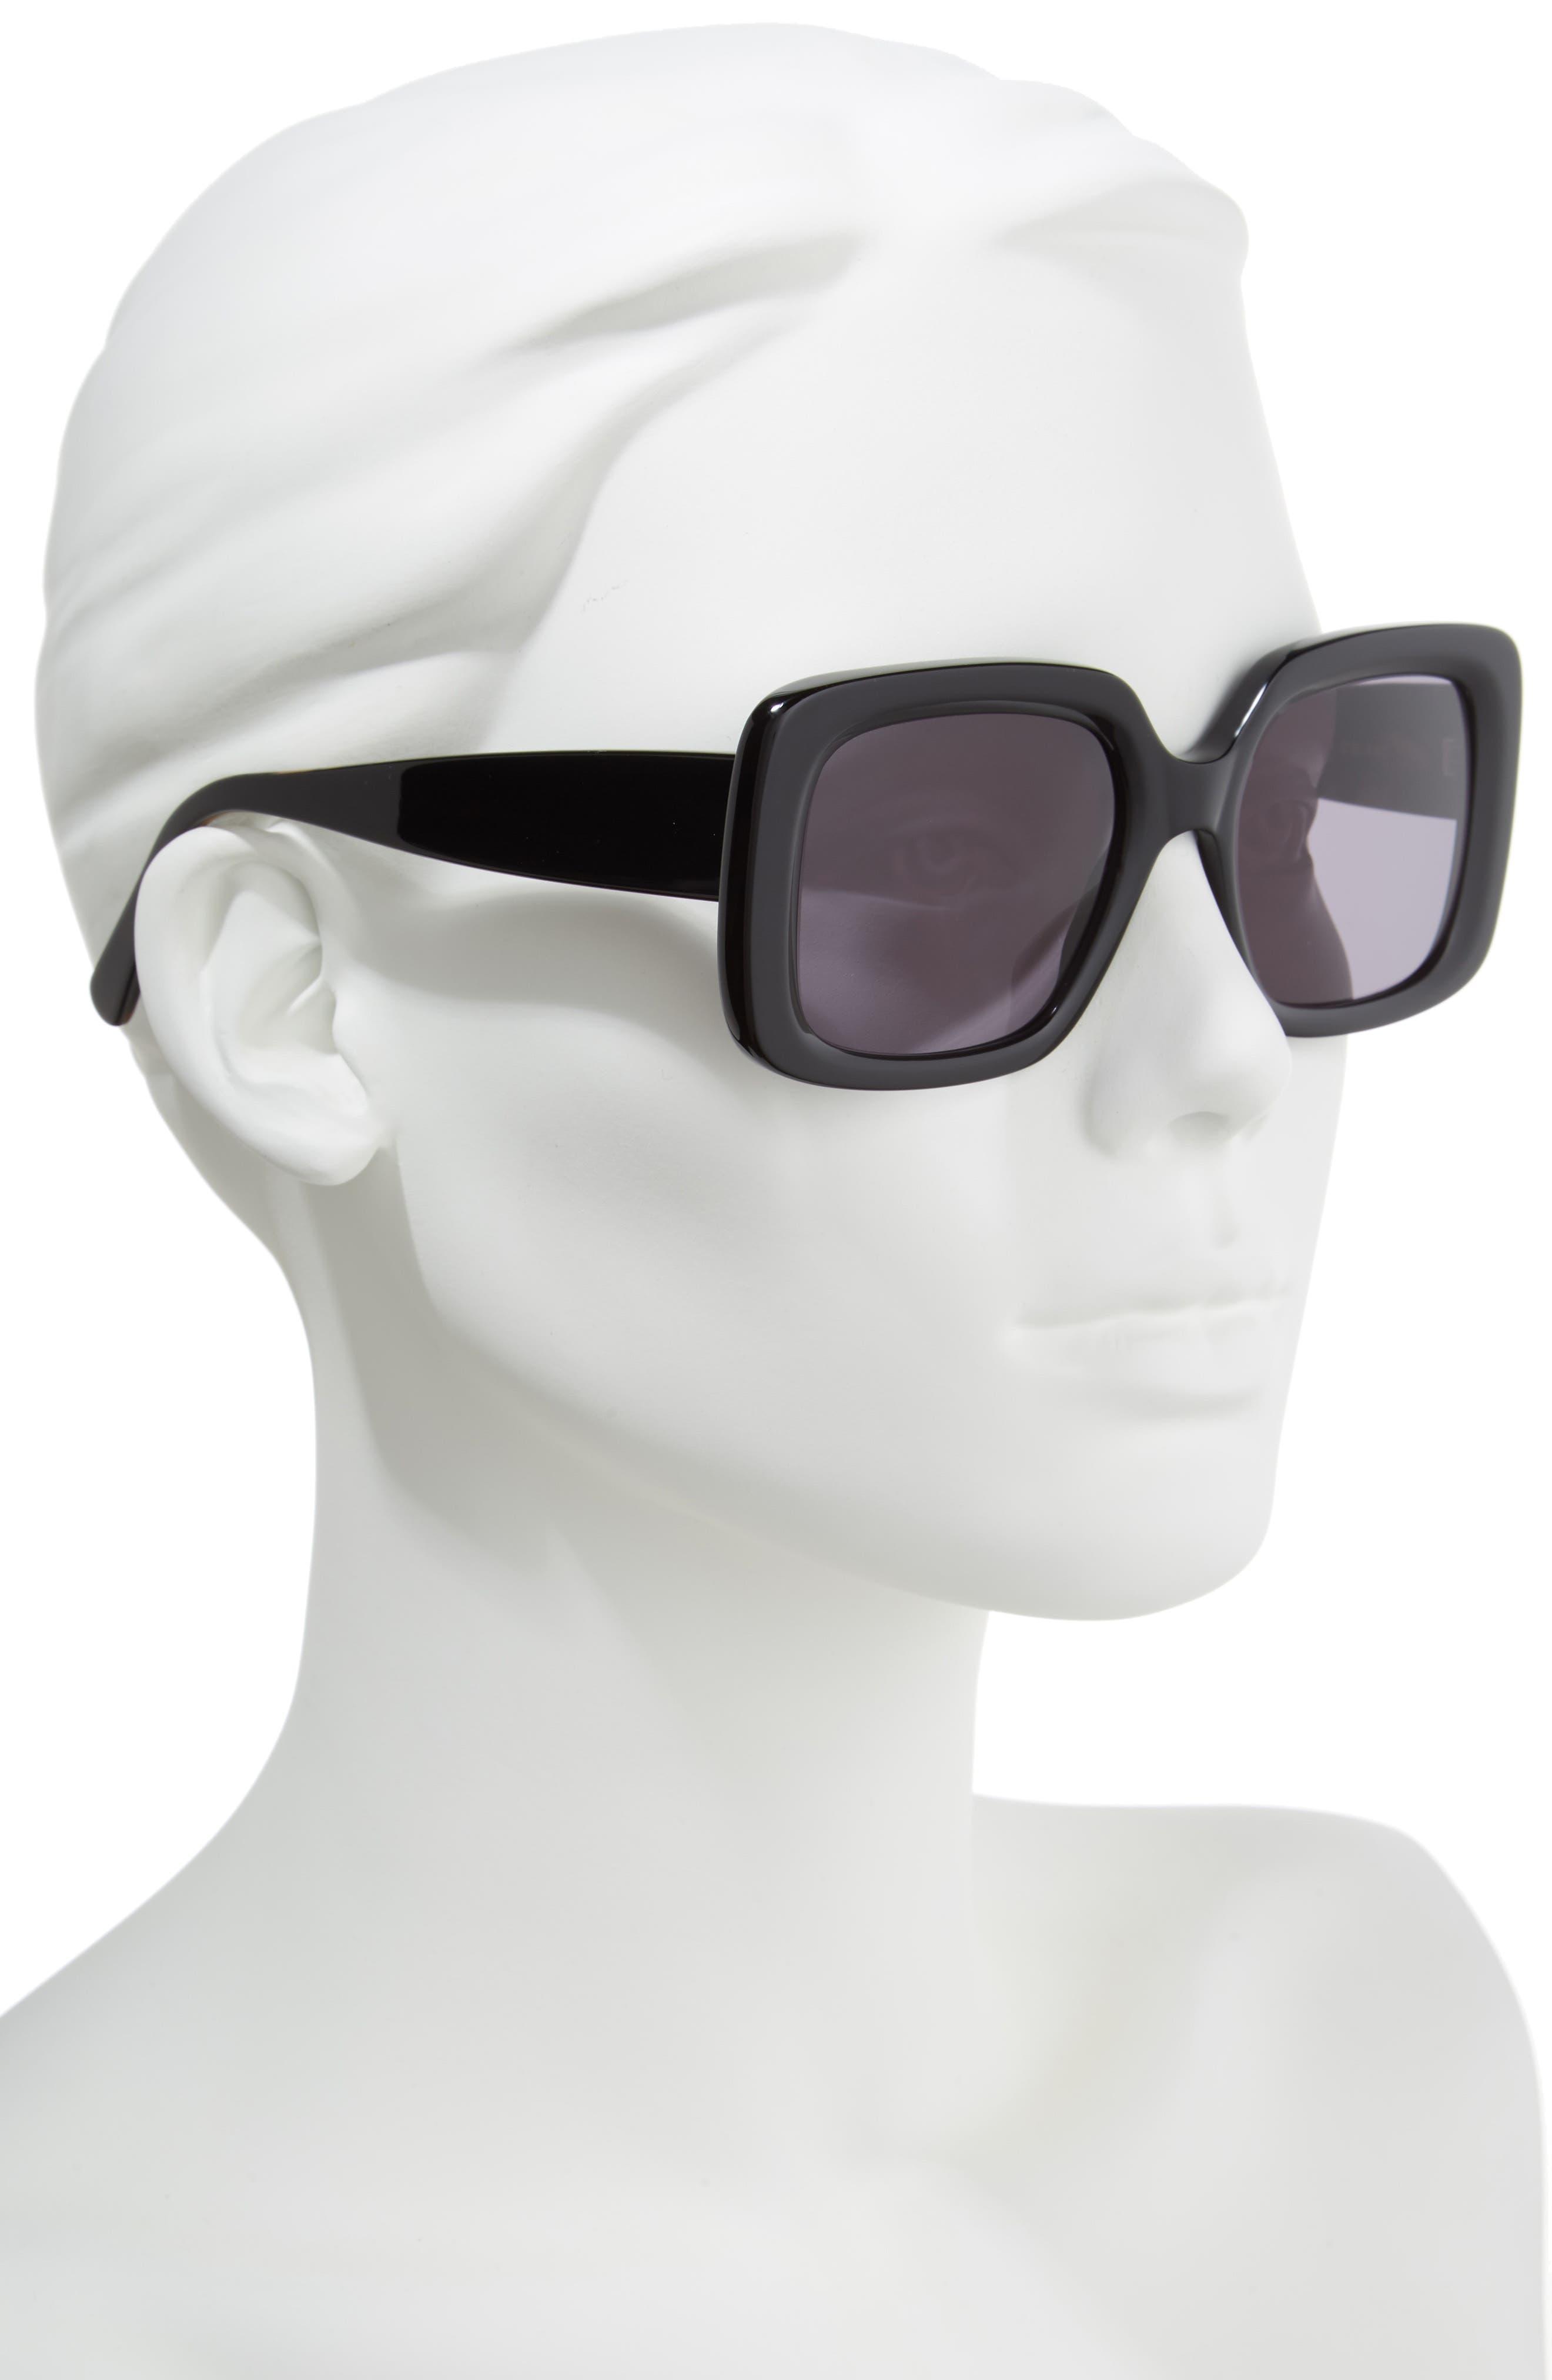 D'BLANC No Promises 53mm Sunglasses,                             Alternate thumbnail 2, color,                             001